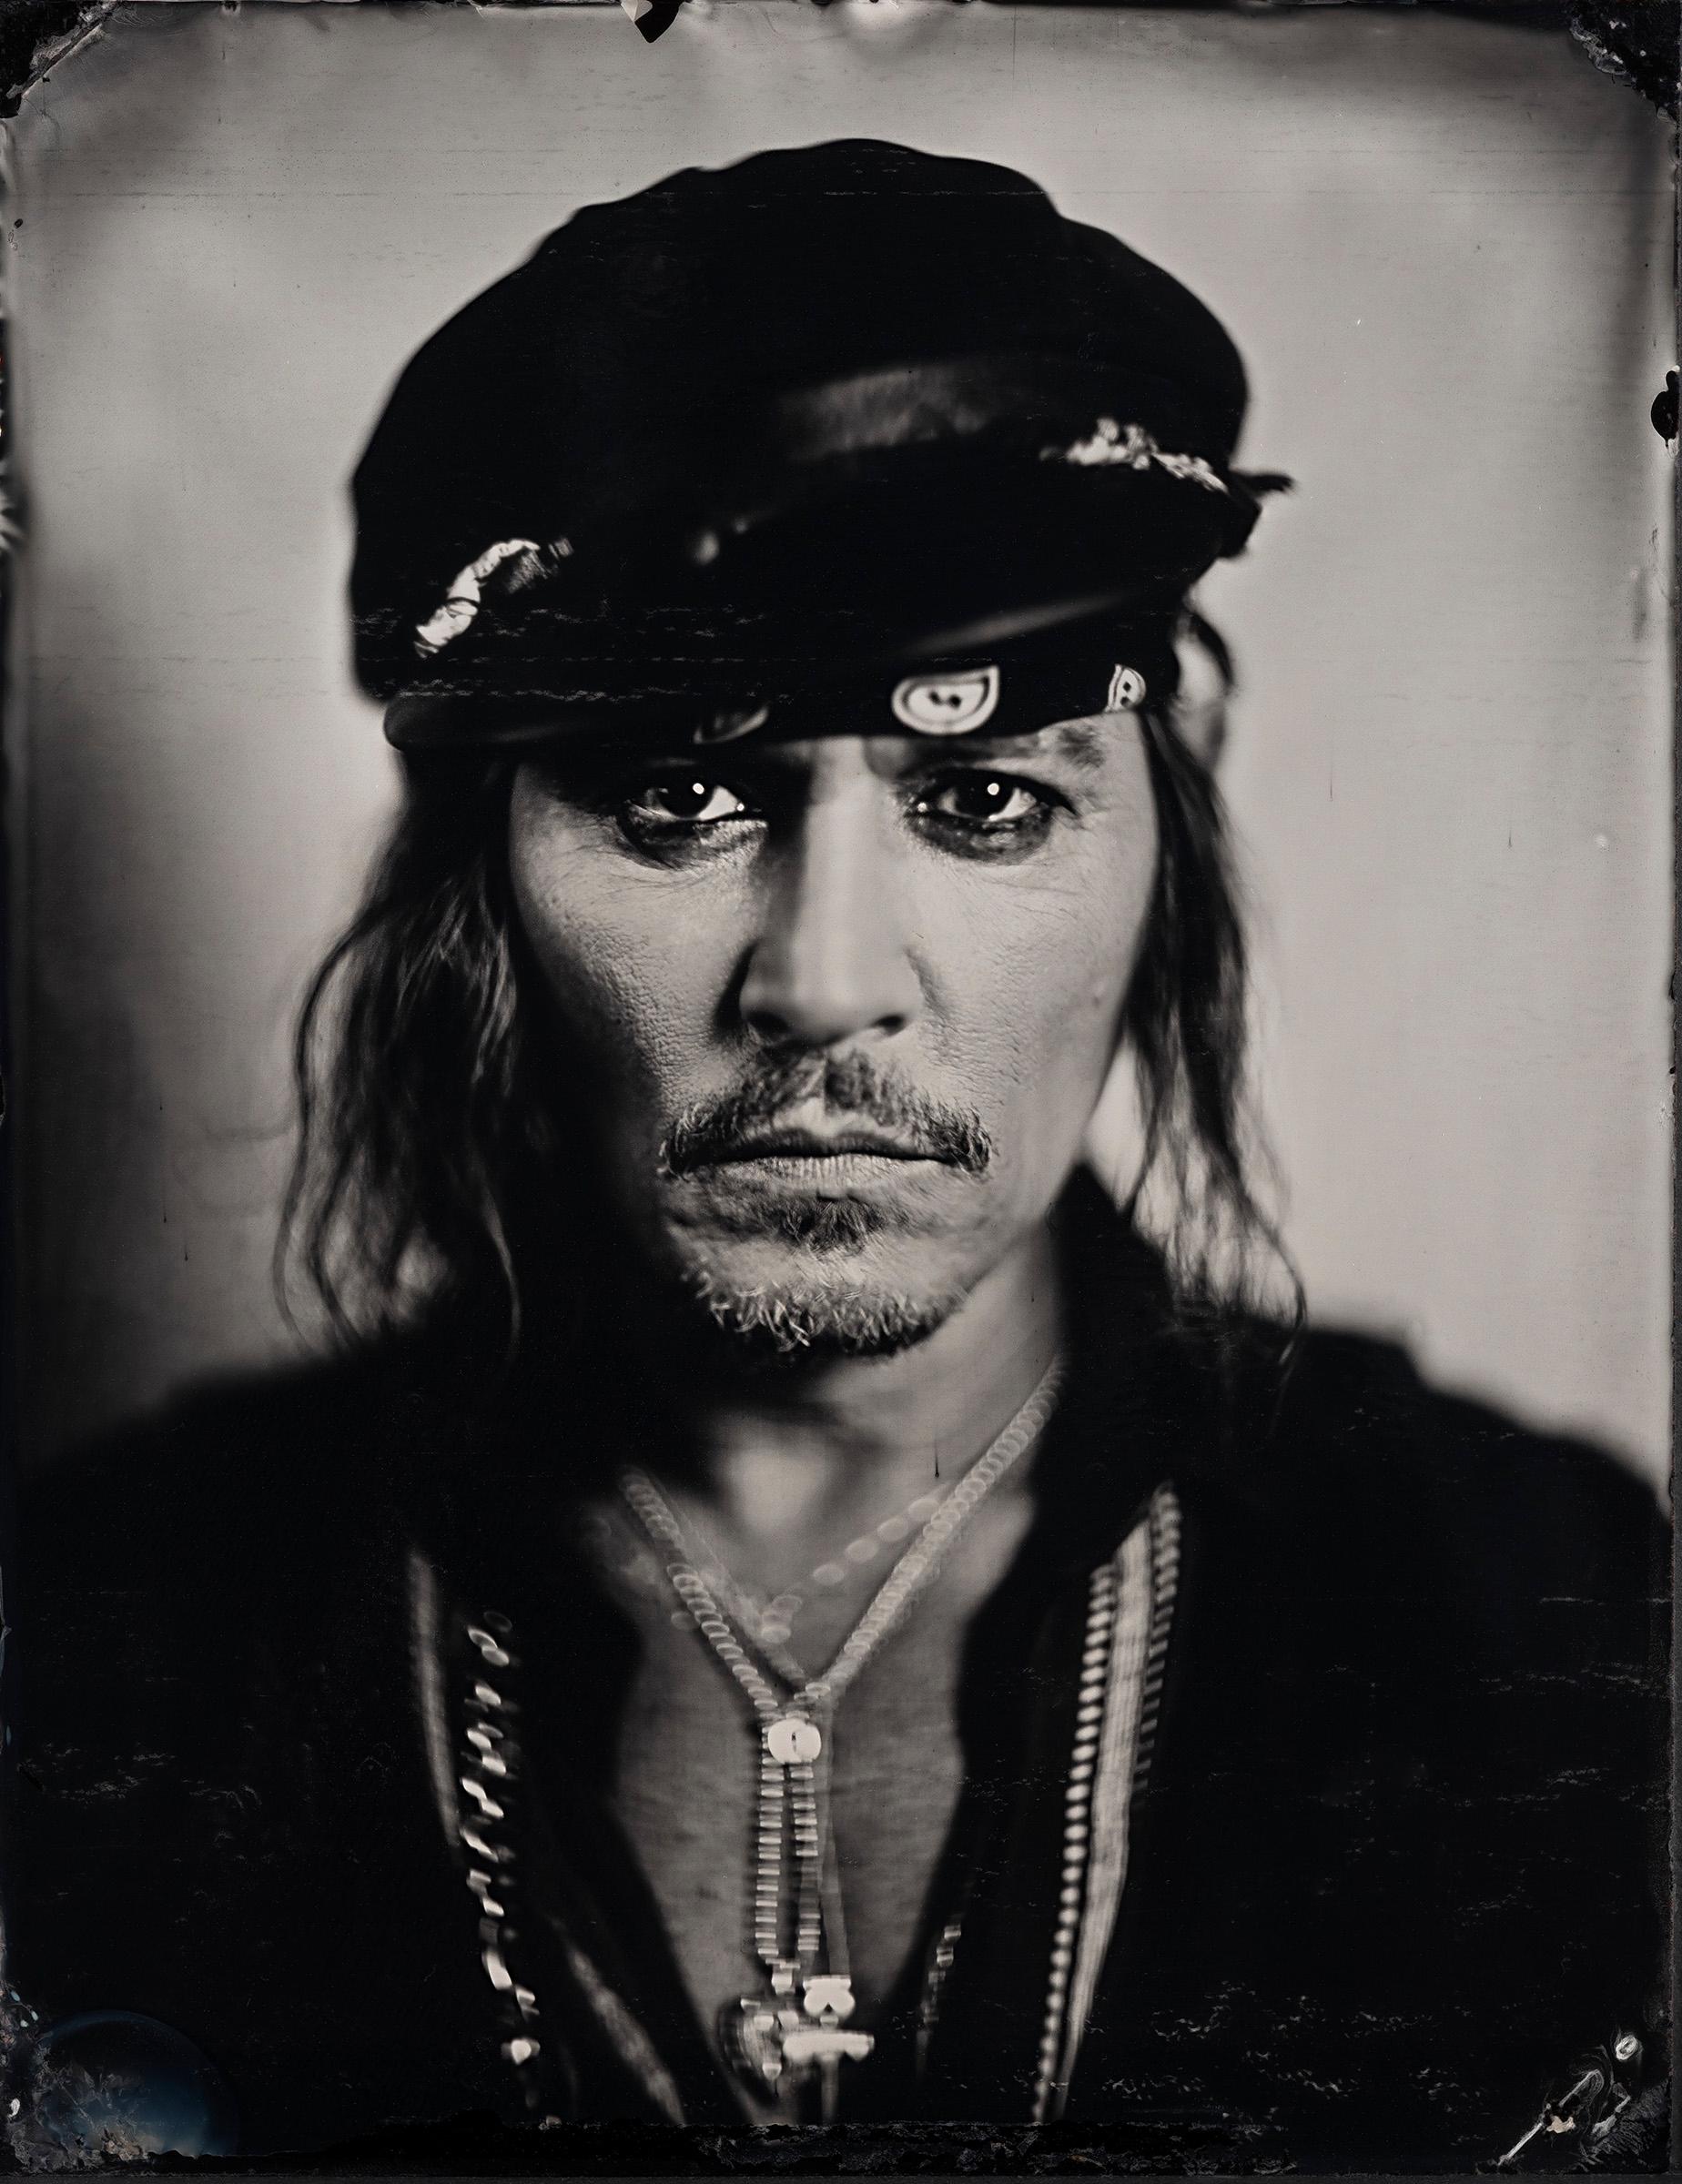 2_Johnny-Depp_Portrait_©Stefan-Sappert.jpg